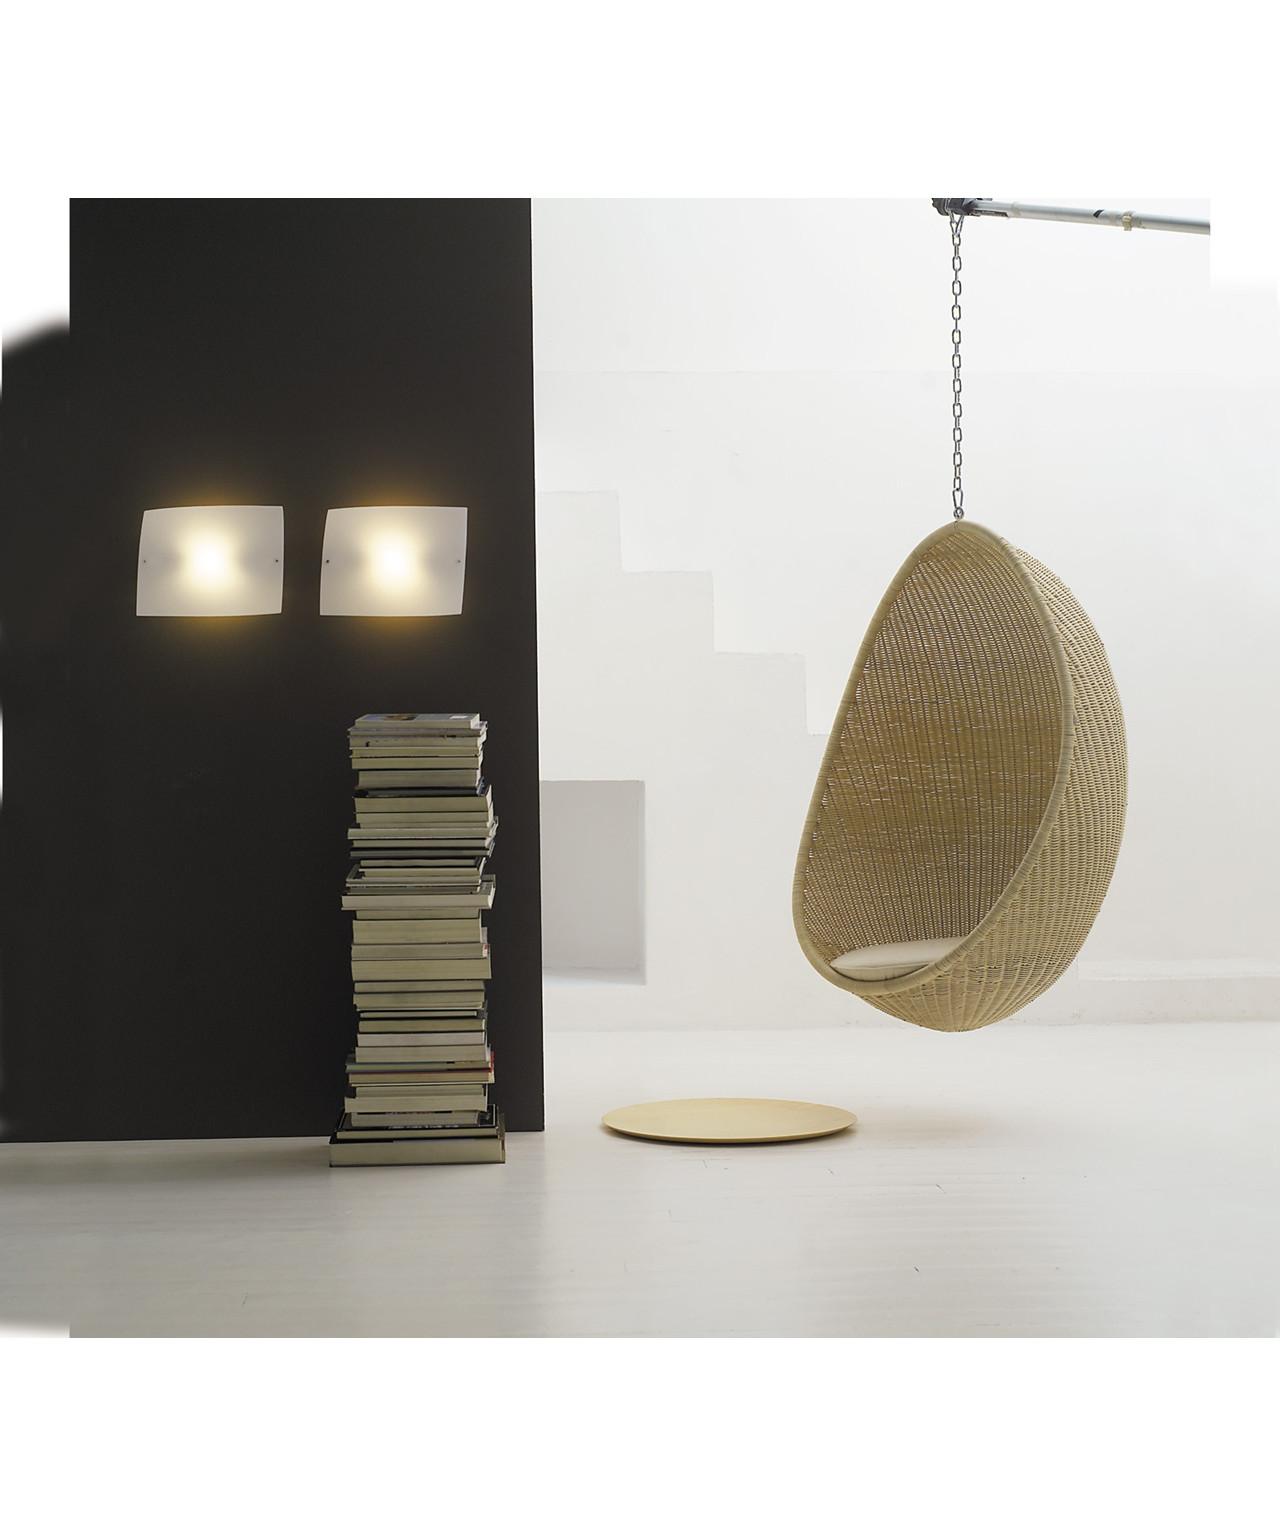 Folio Væglampe/Loftlampe Hvid - Foscarini